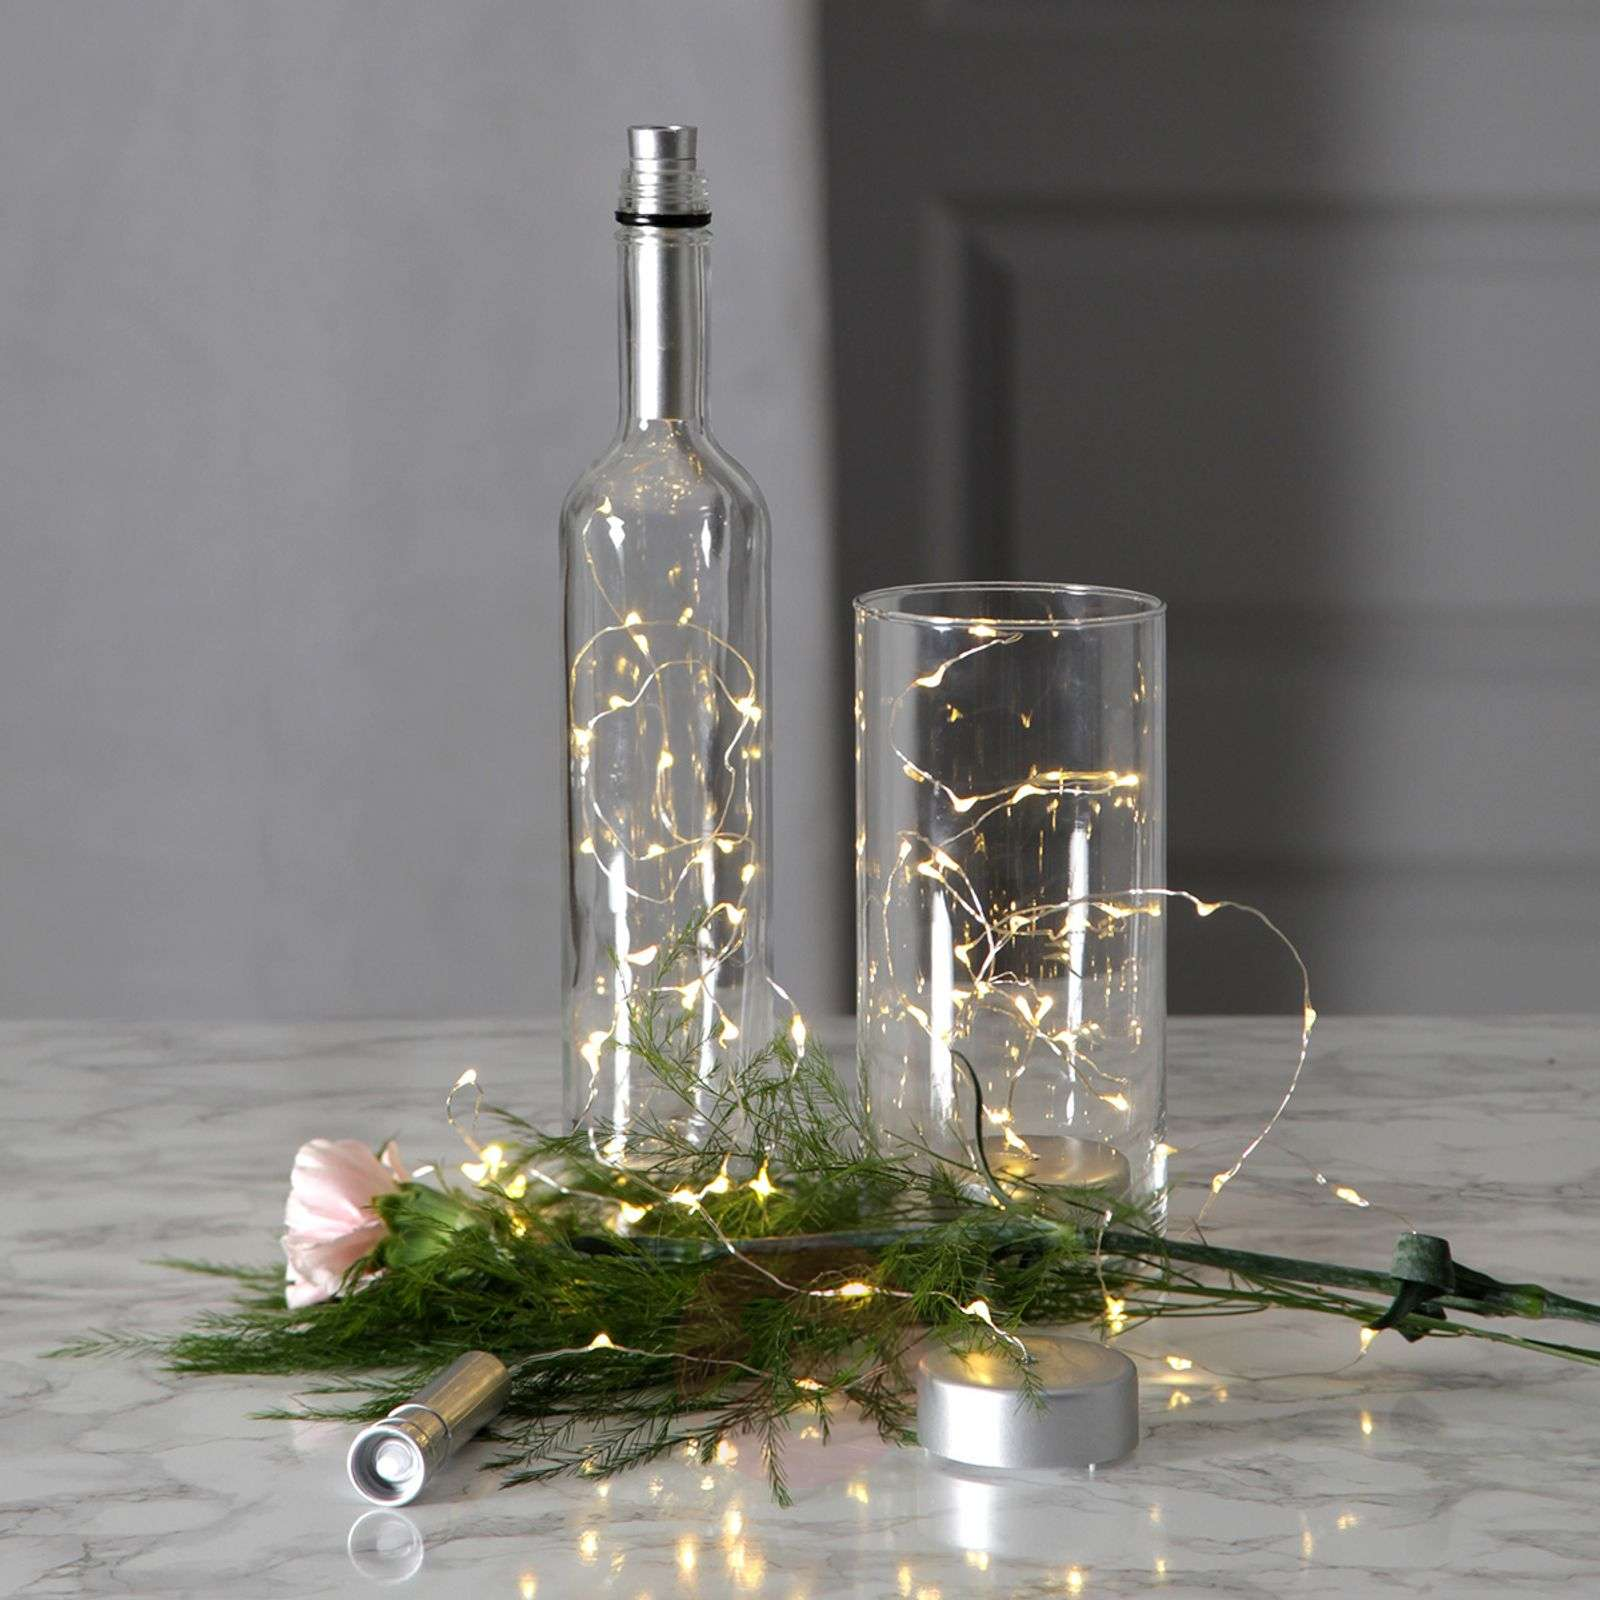 Dew Drops battery-powered LED string lights, 100cm-1523116-01